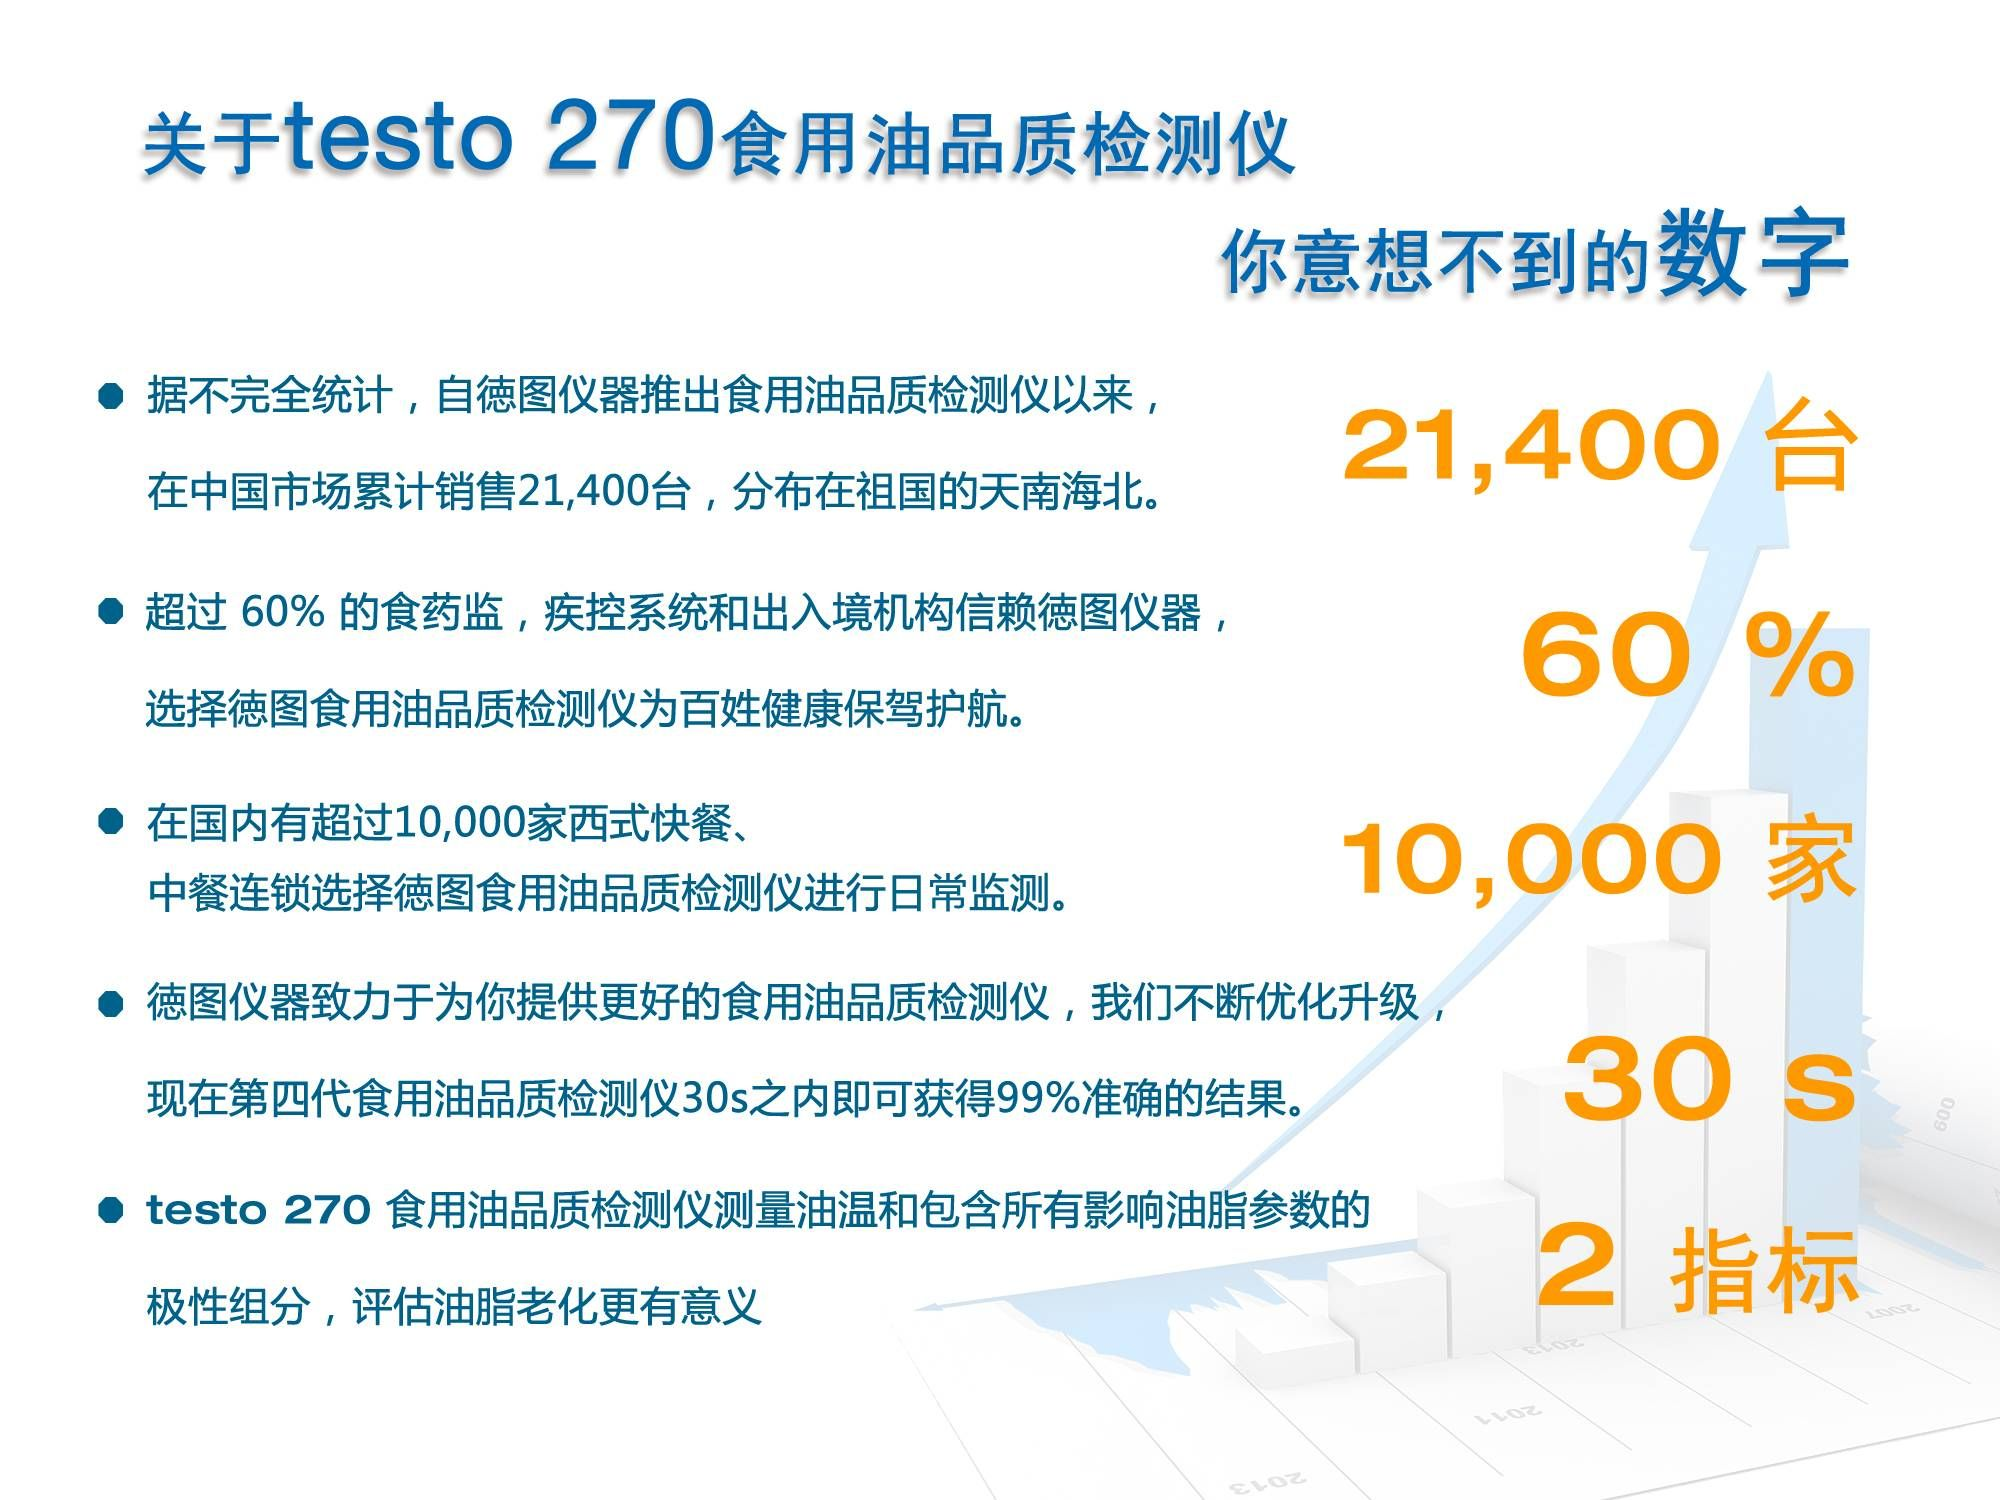 cn-270-2nd-white-2000x1500.jpg